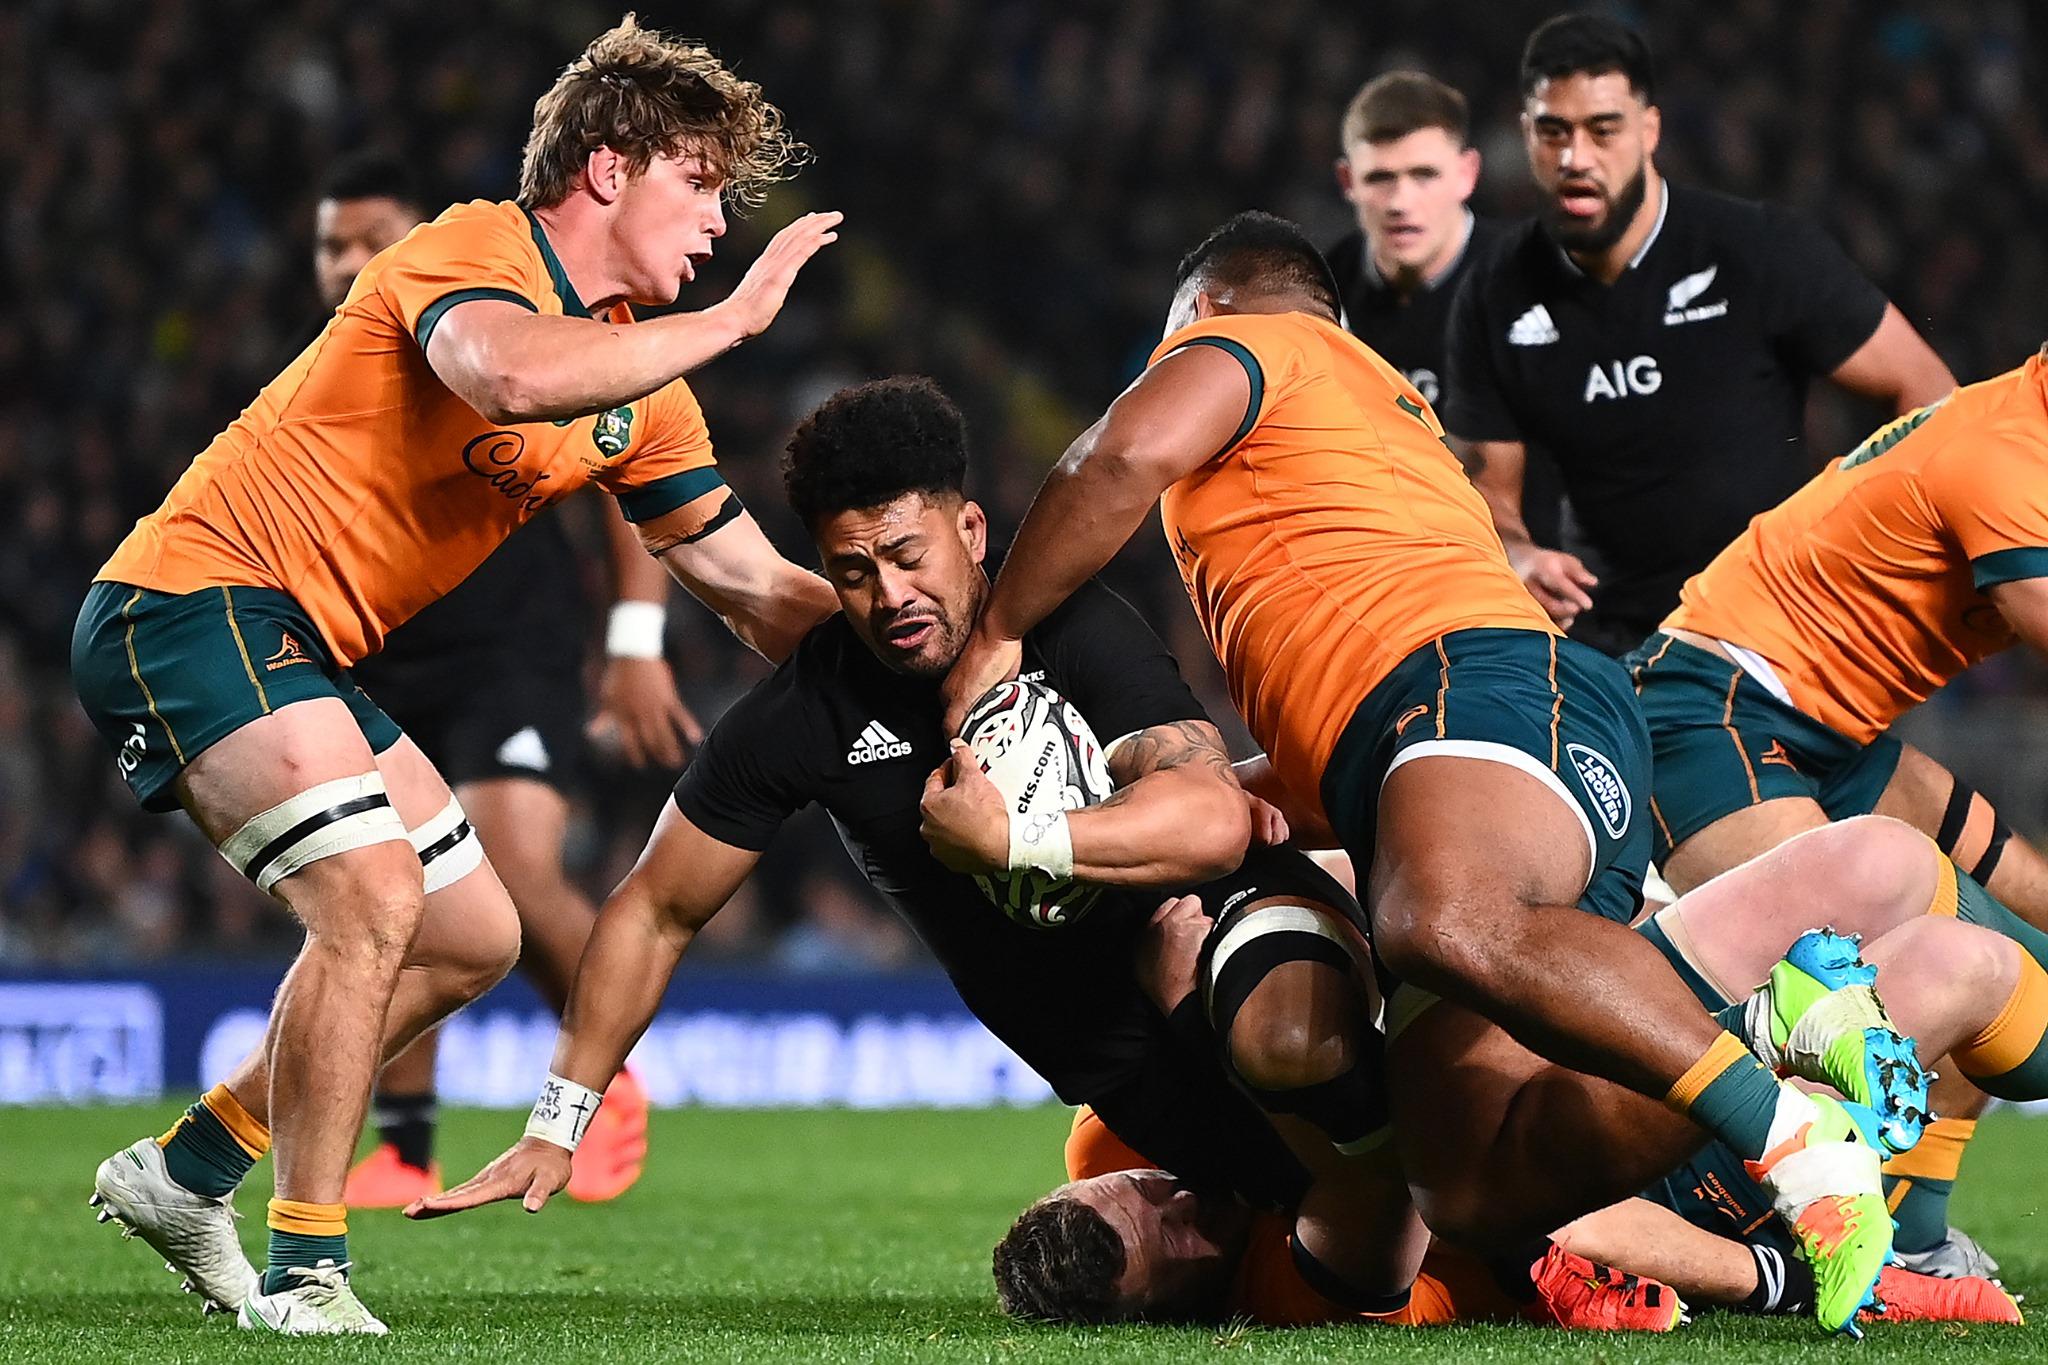 Rugby Championship: All Blacks devastanti, Australia battuta 57-22 (Ph. All Blacks)